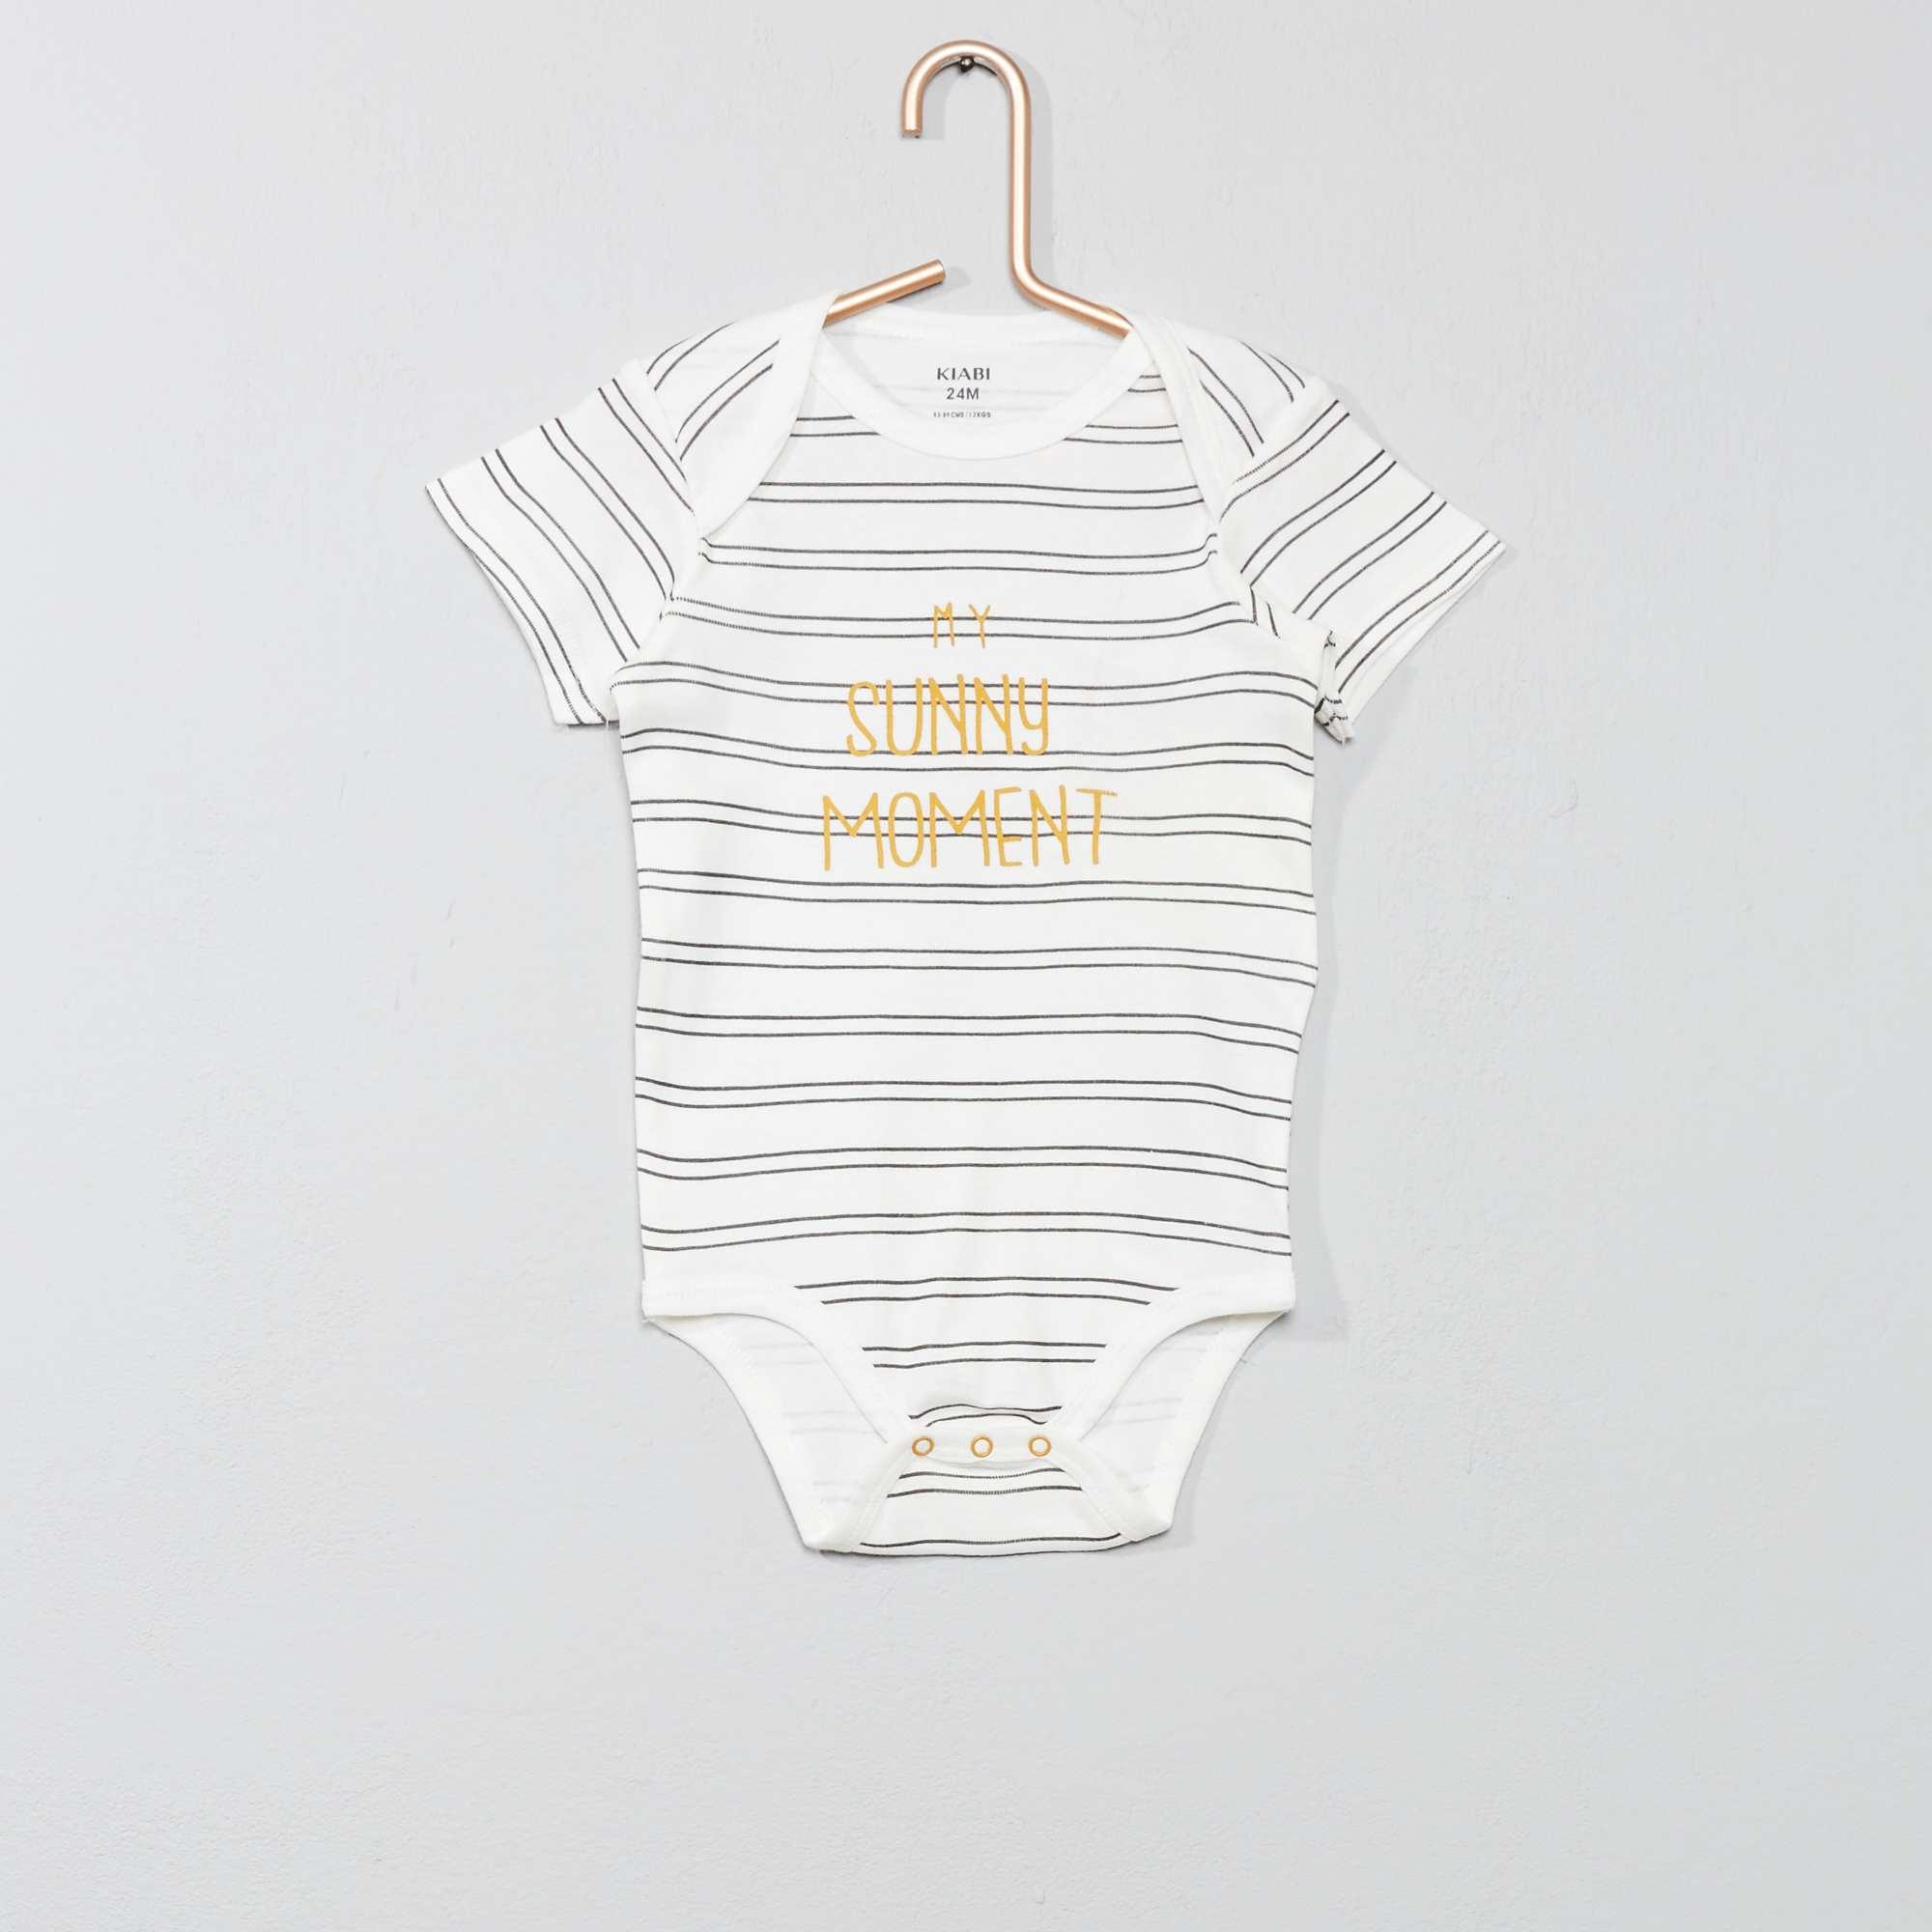 Aparte Babykleding.Rompertje Met Print En Envelophals Jongens Babykleding Wit Kiabi